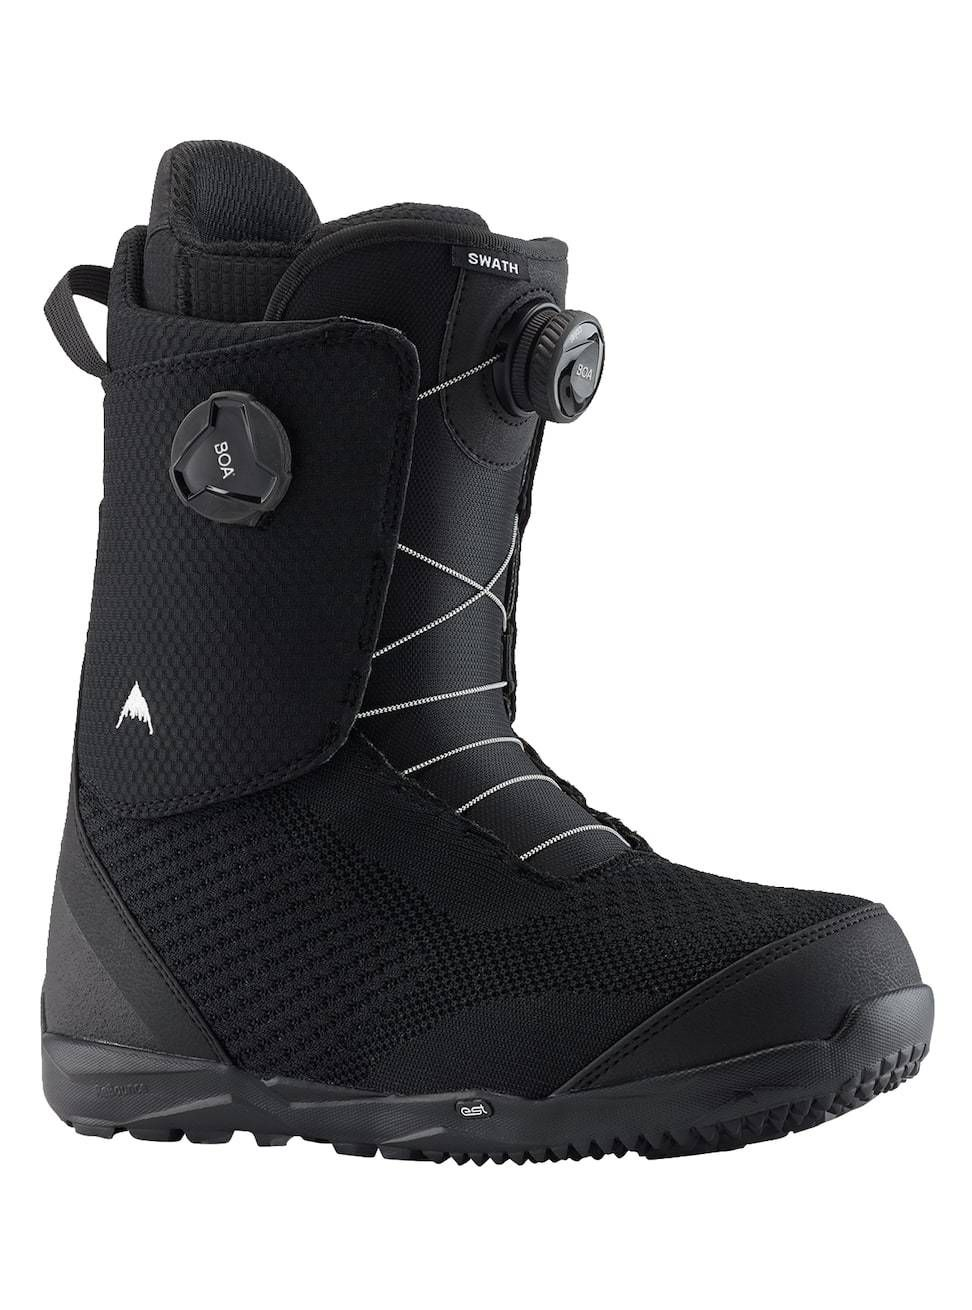 d72b859200cc Burton Men s Swath Boa® Snowboard Boot